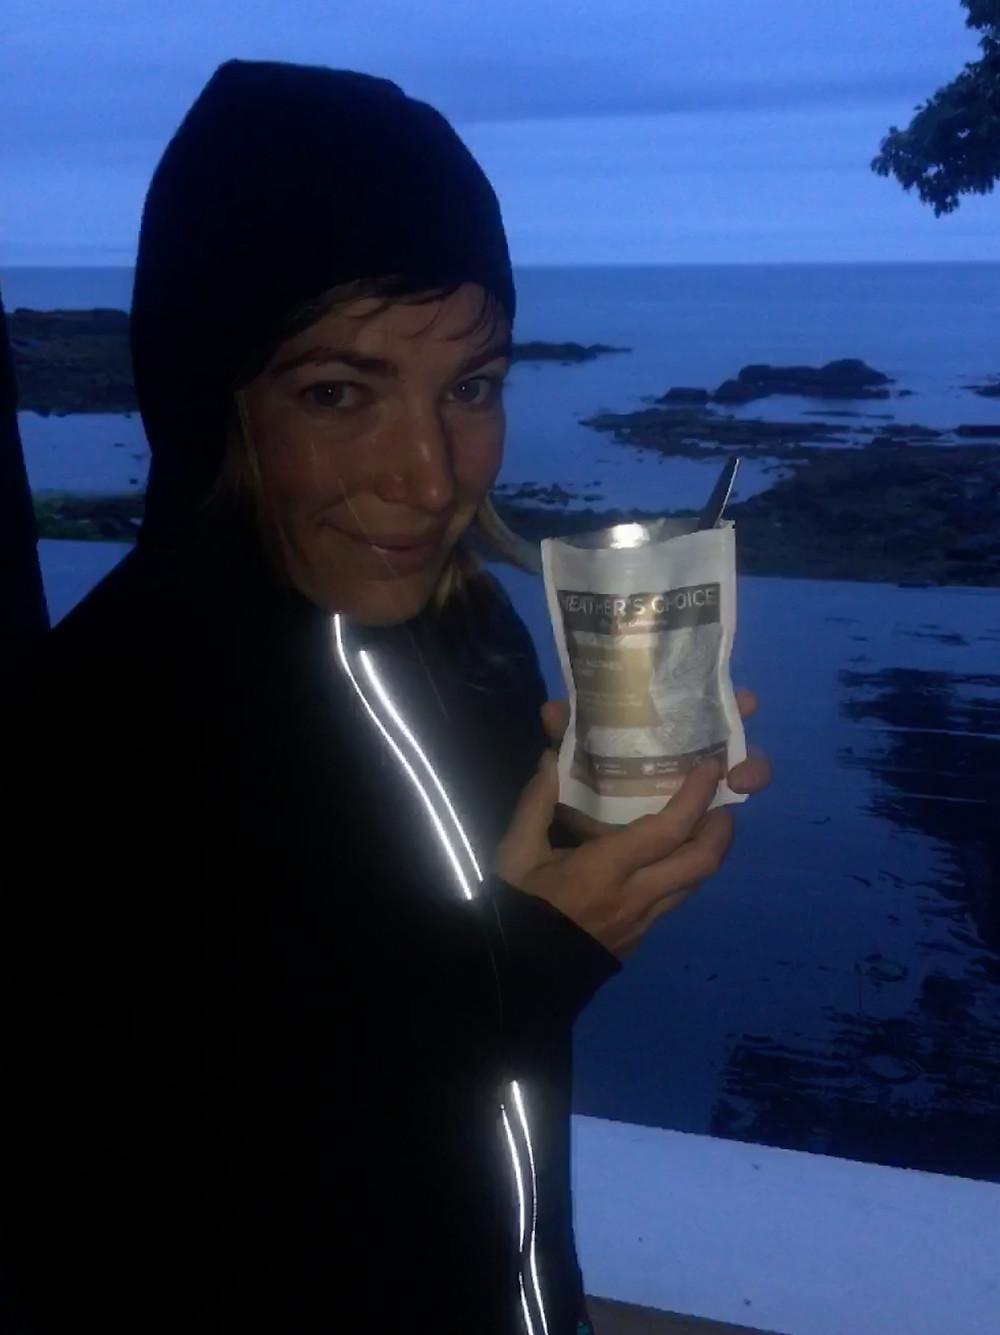 Pre-dawn breakfast of Heather's Choice Banana Nutmeg Breakfast